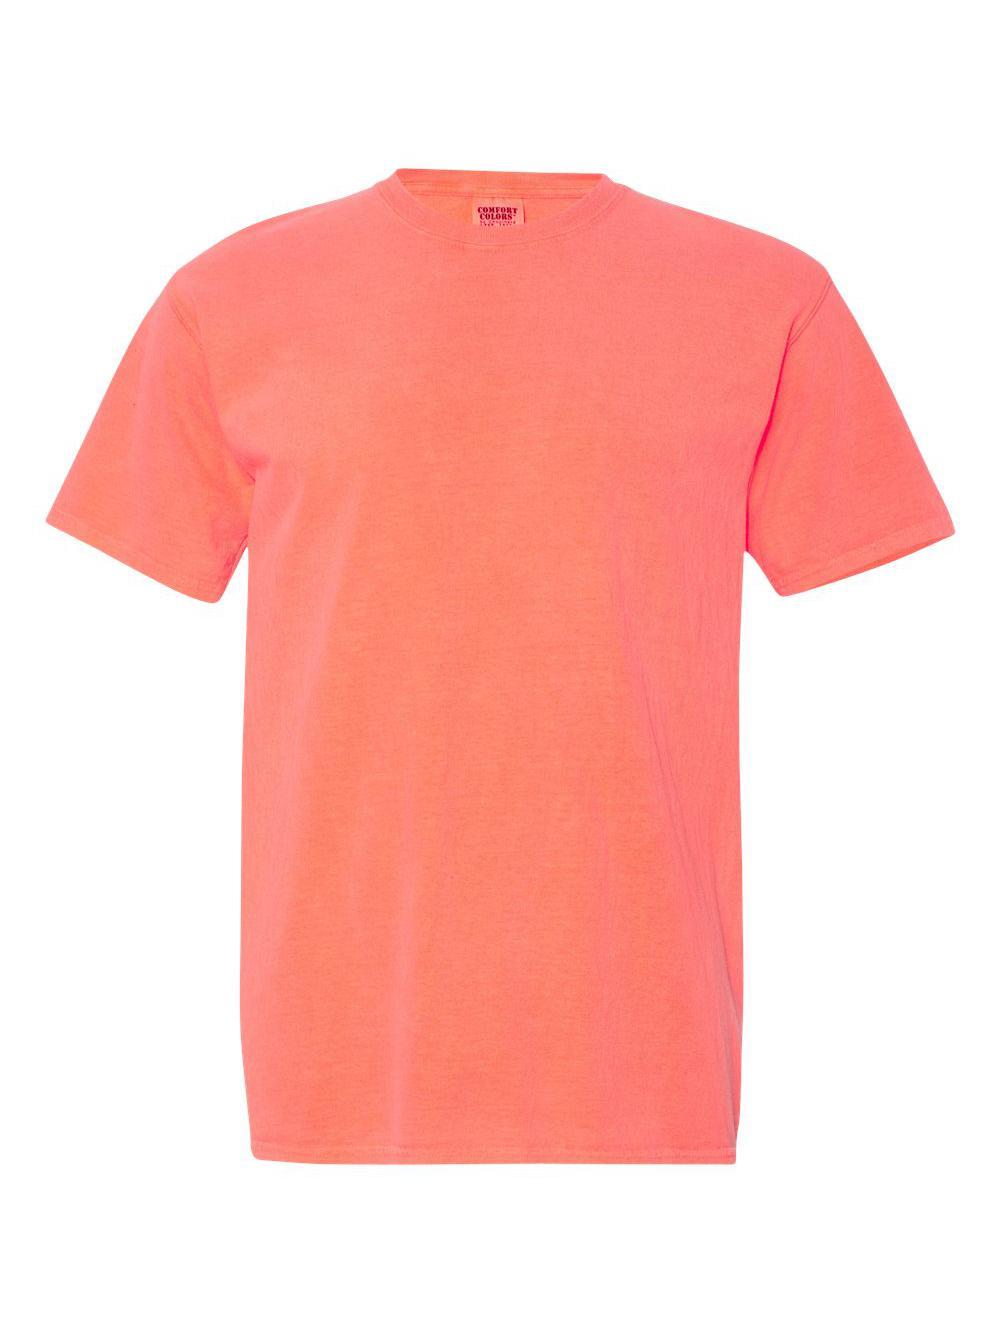 Comfort-Colors-Garment-Dyed-Heavyweight-Ringspun-Short-Sleeve-Shirt-1717 thumbnail 99